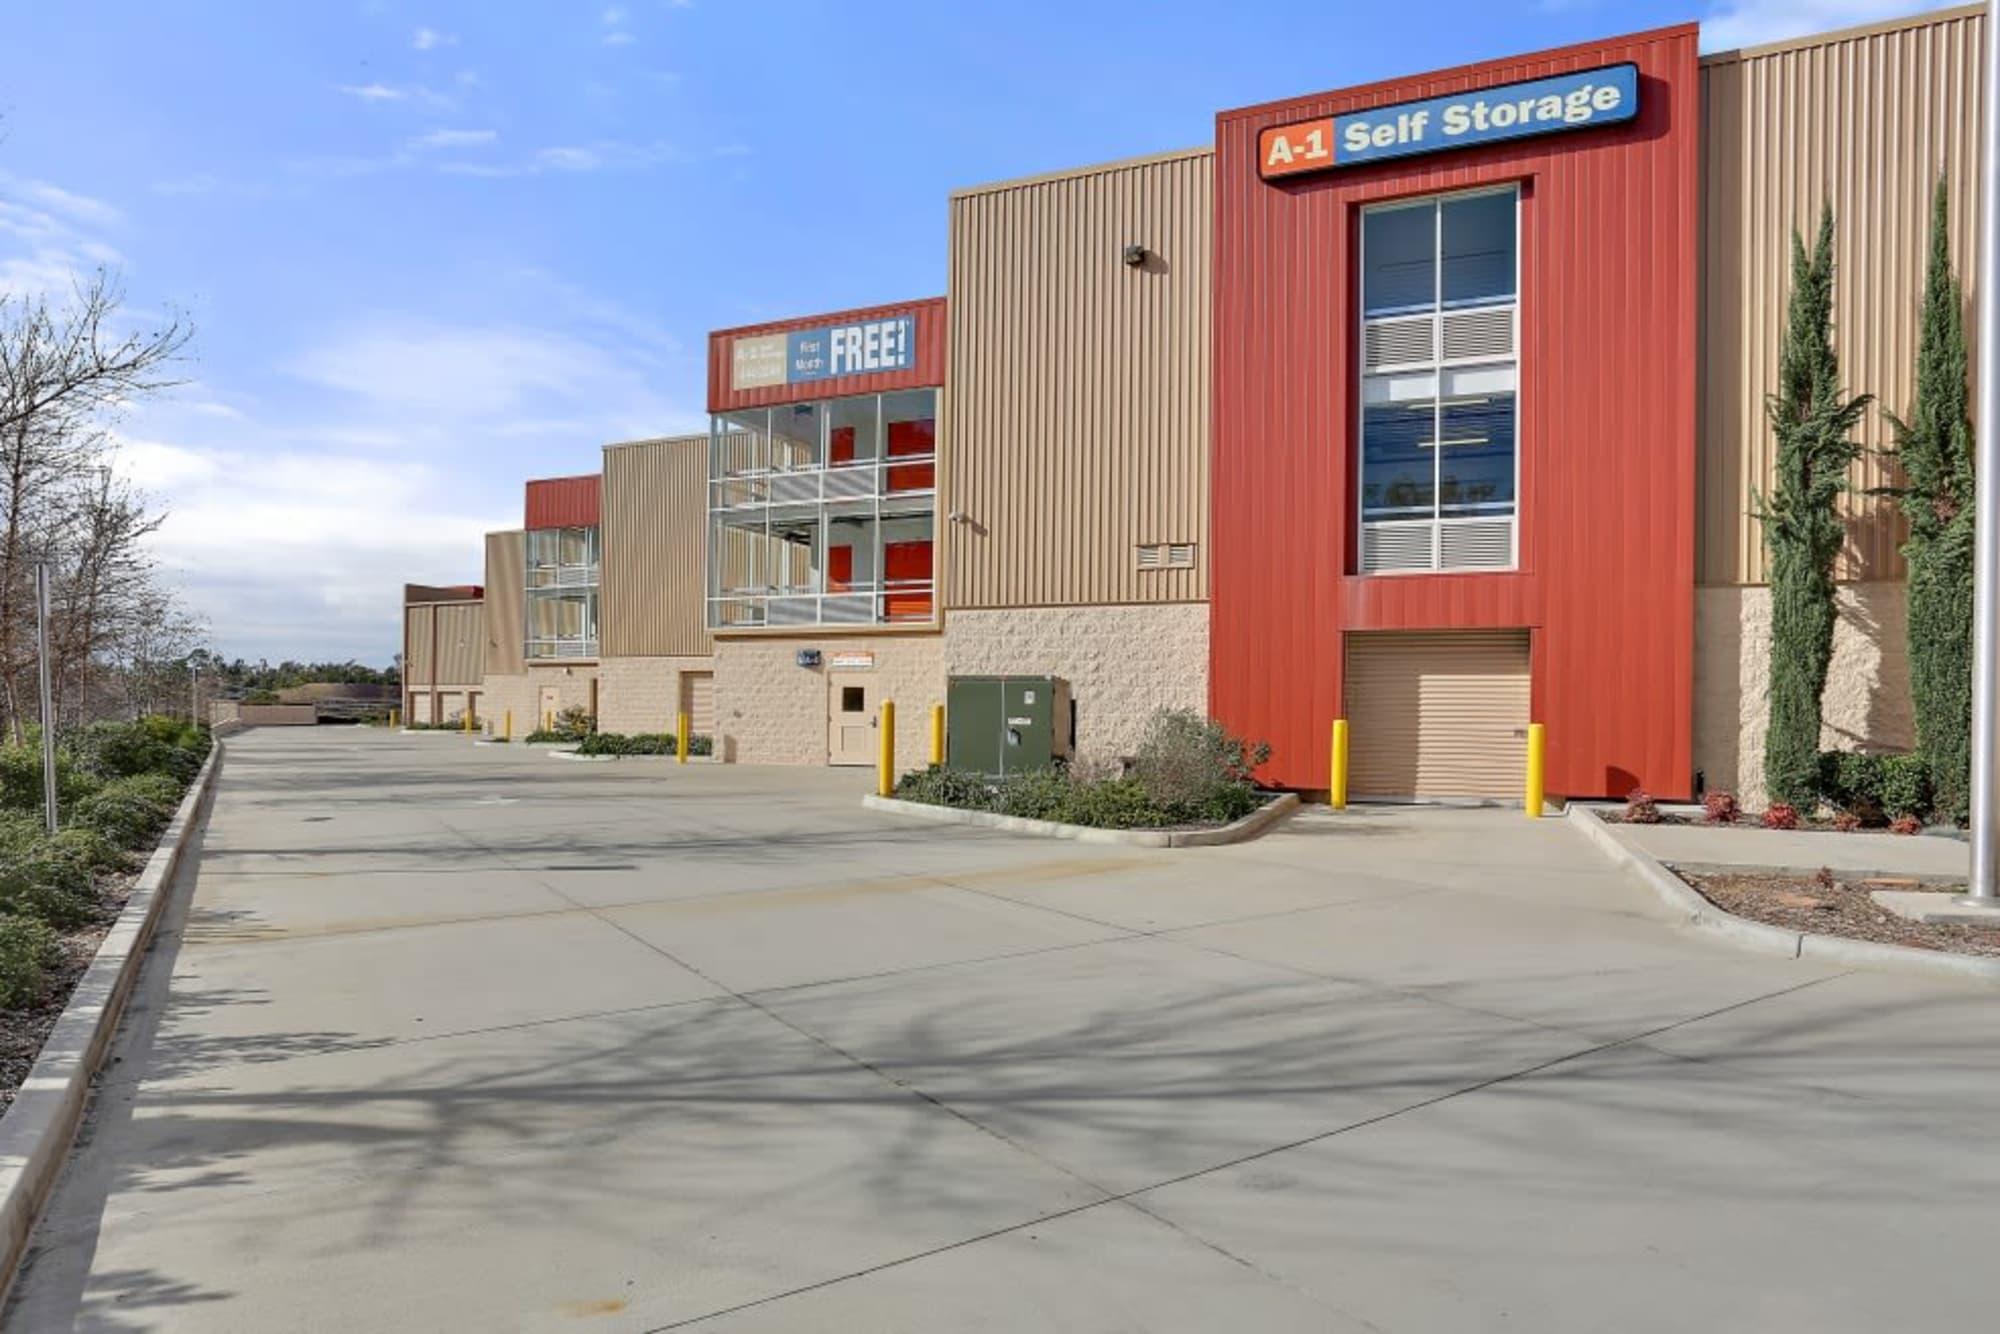 Entrance at A-1 Self Storage in San Diego, CA